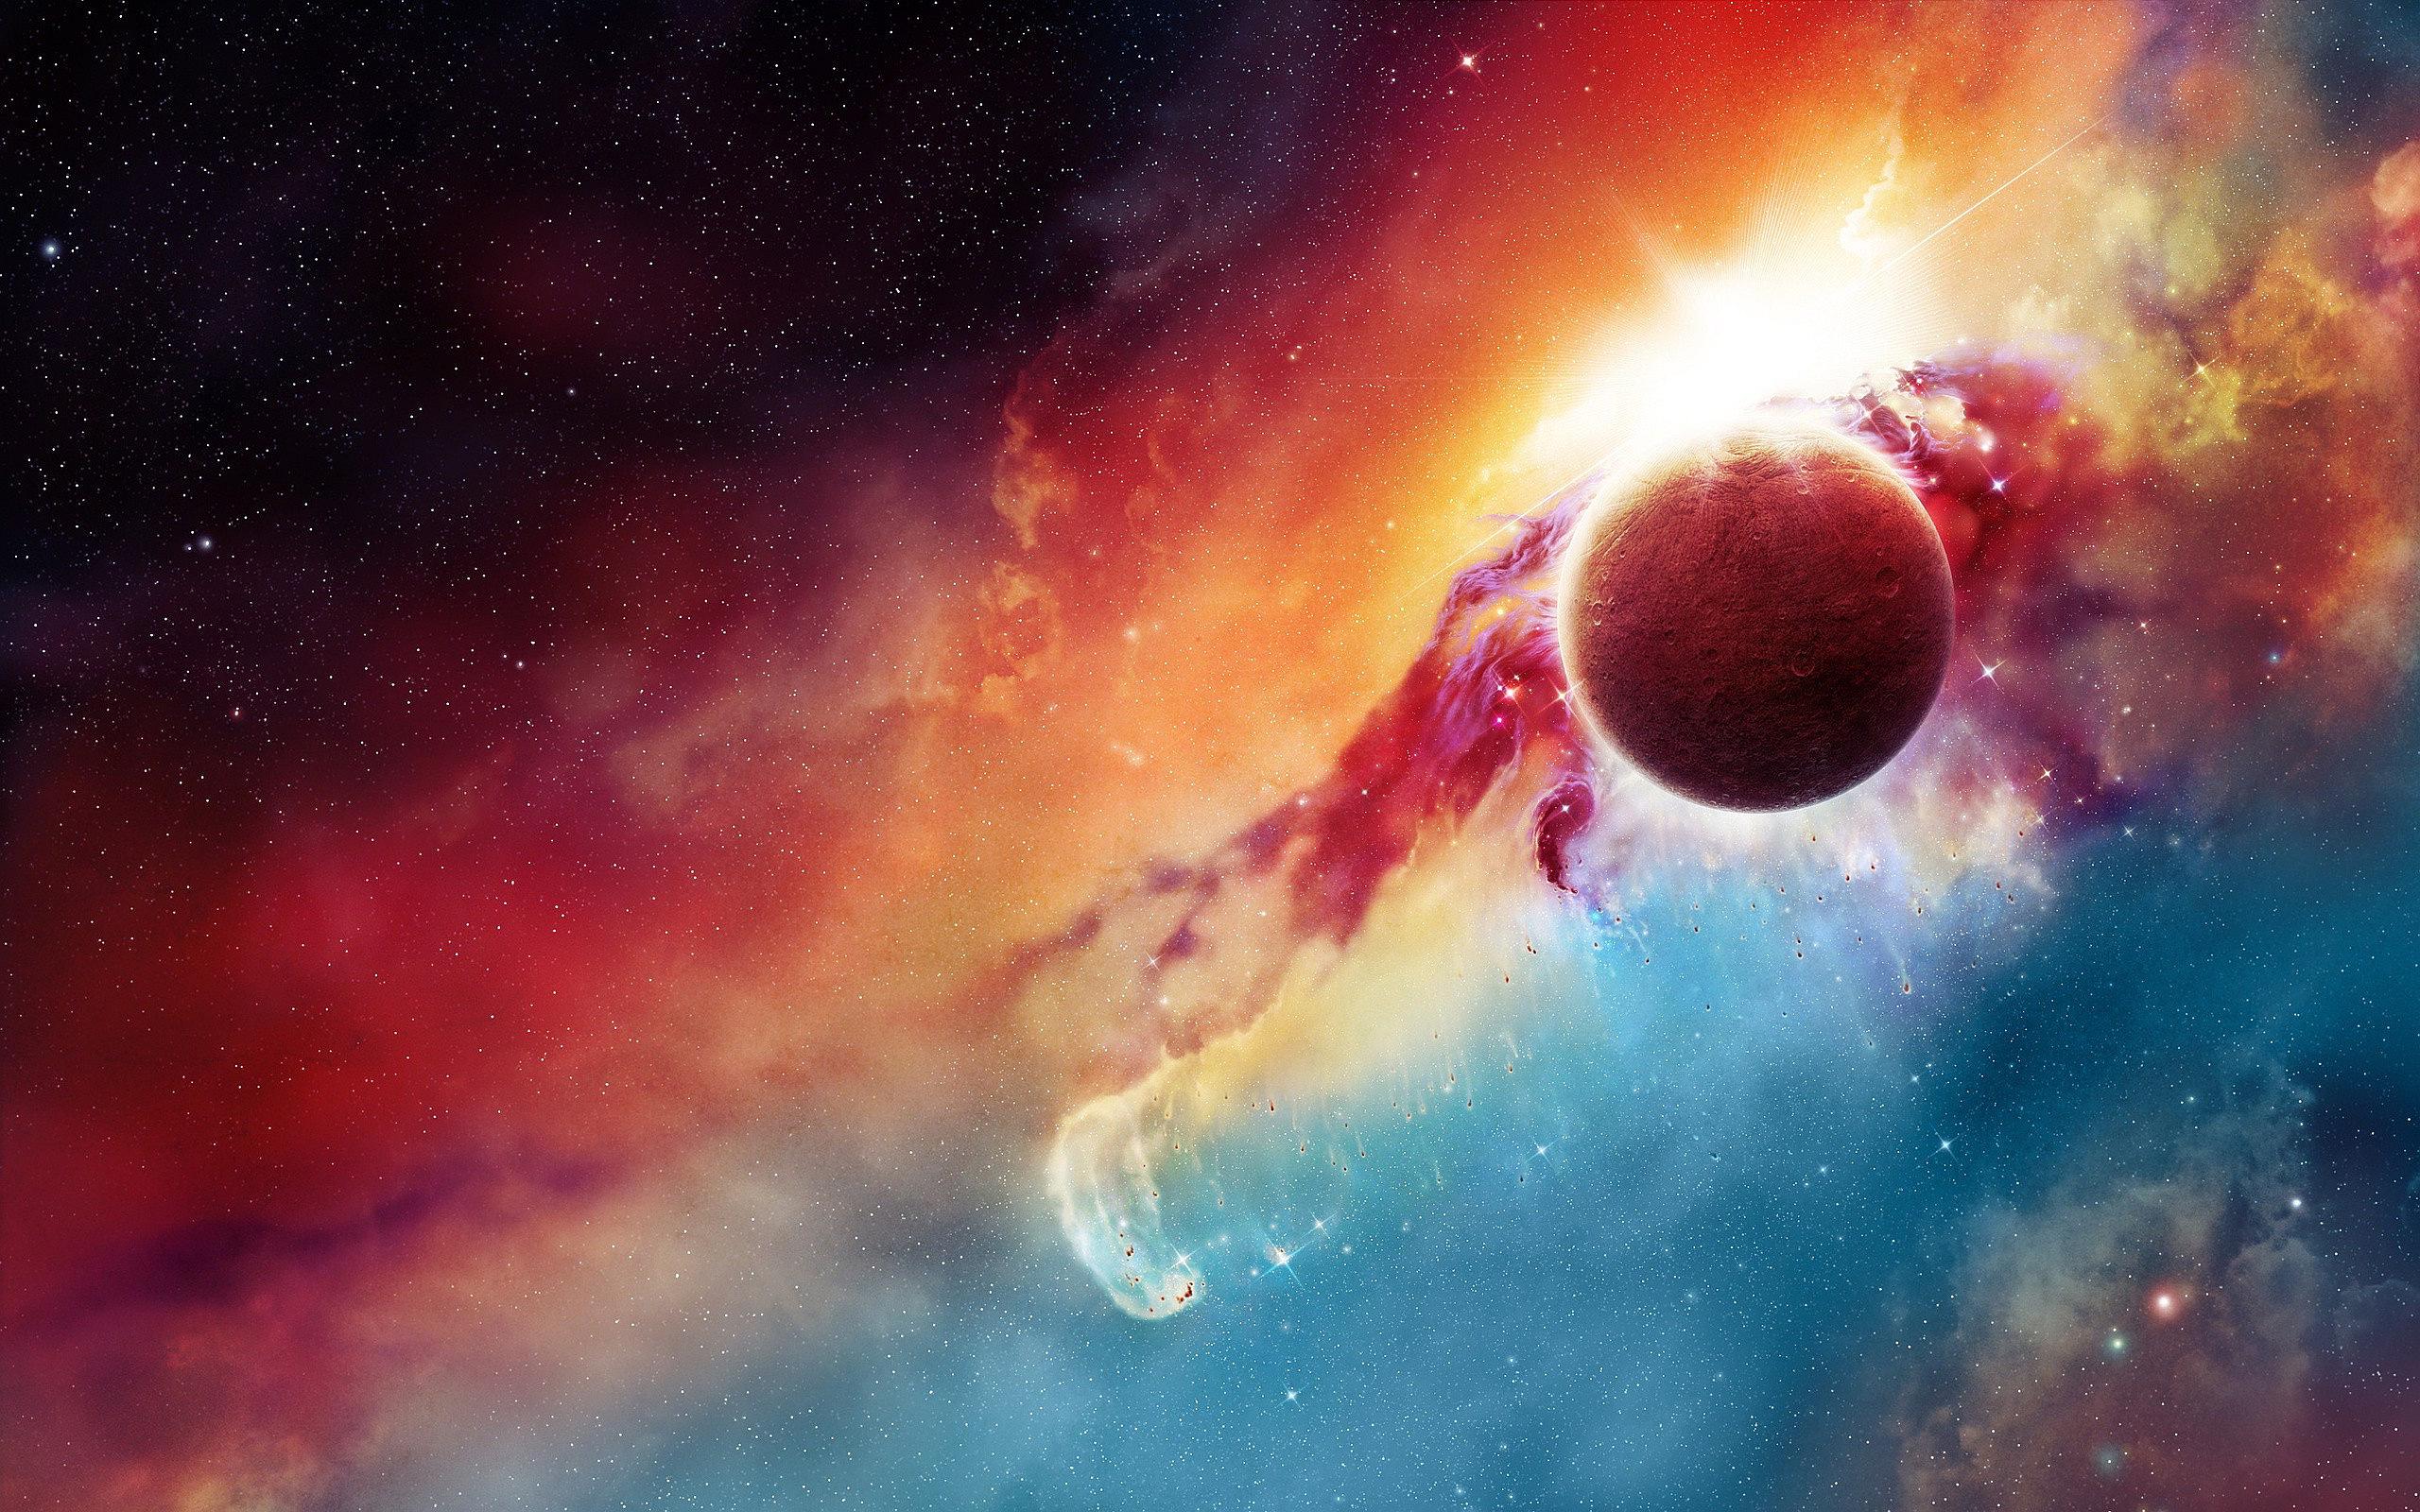 star background wallpaper